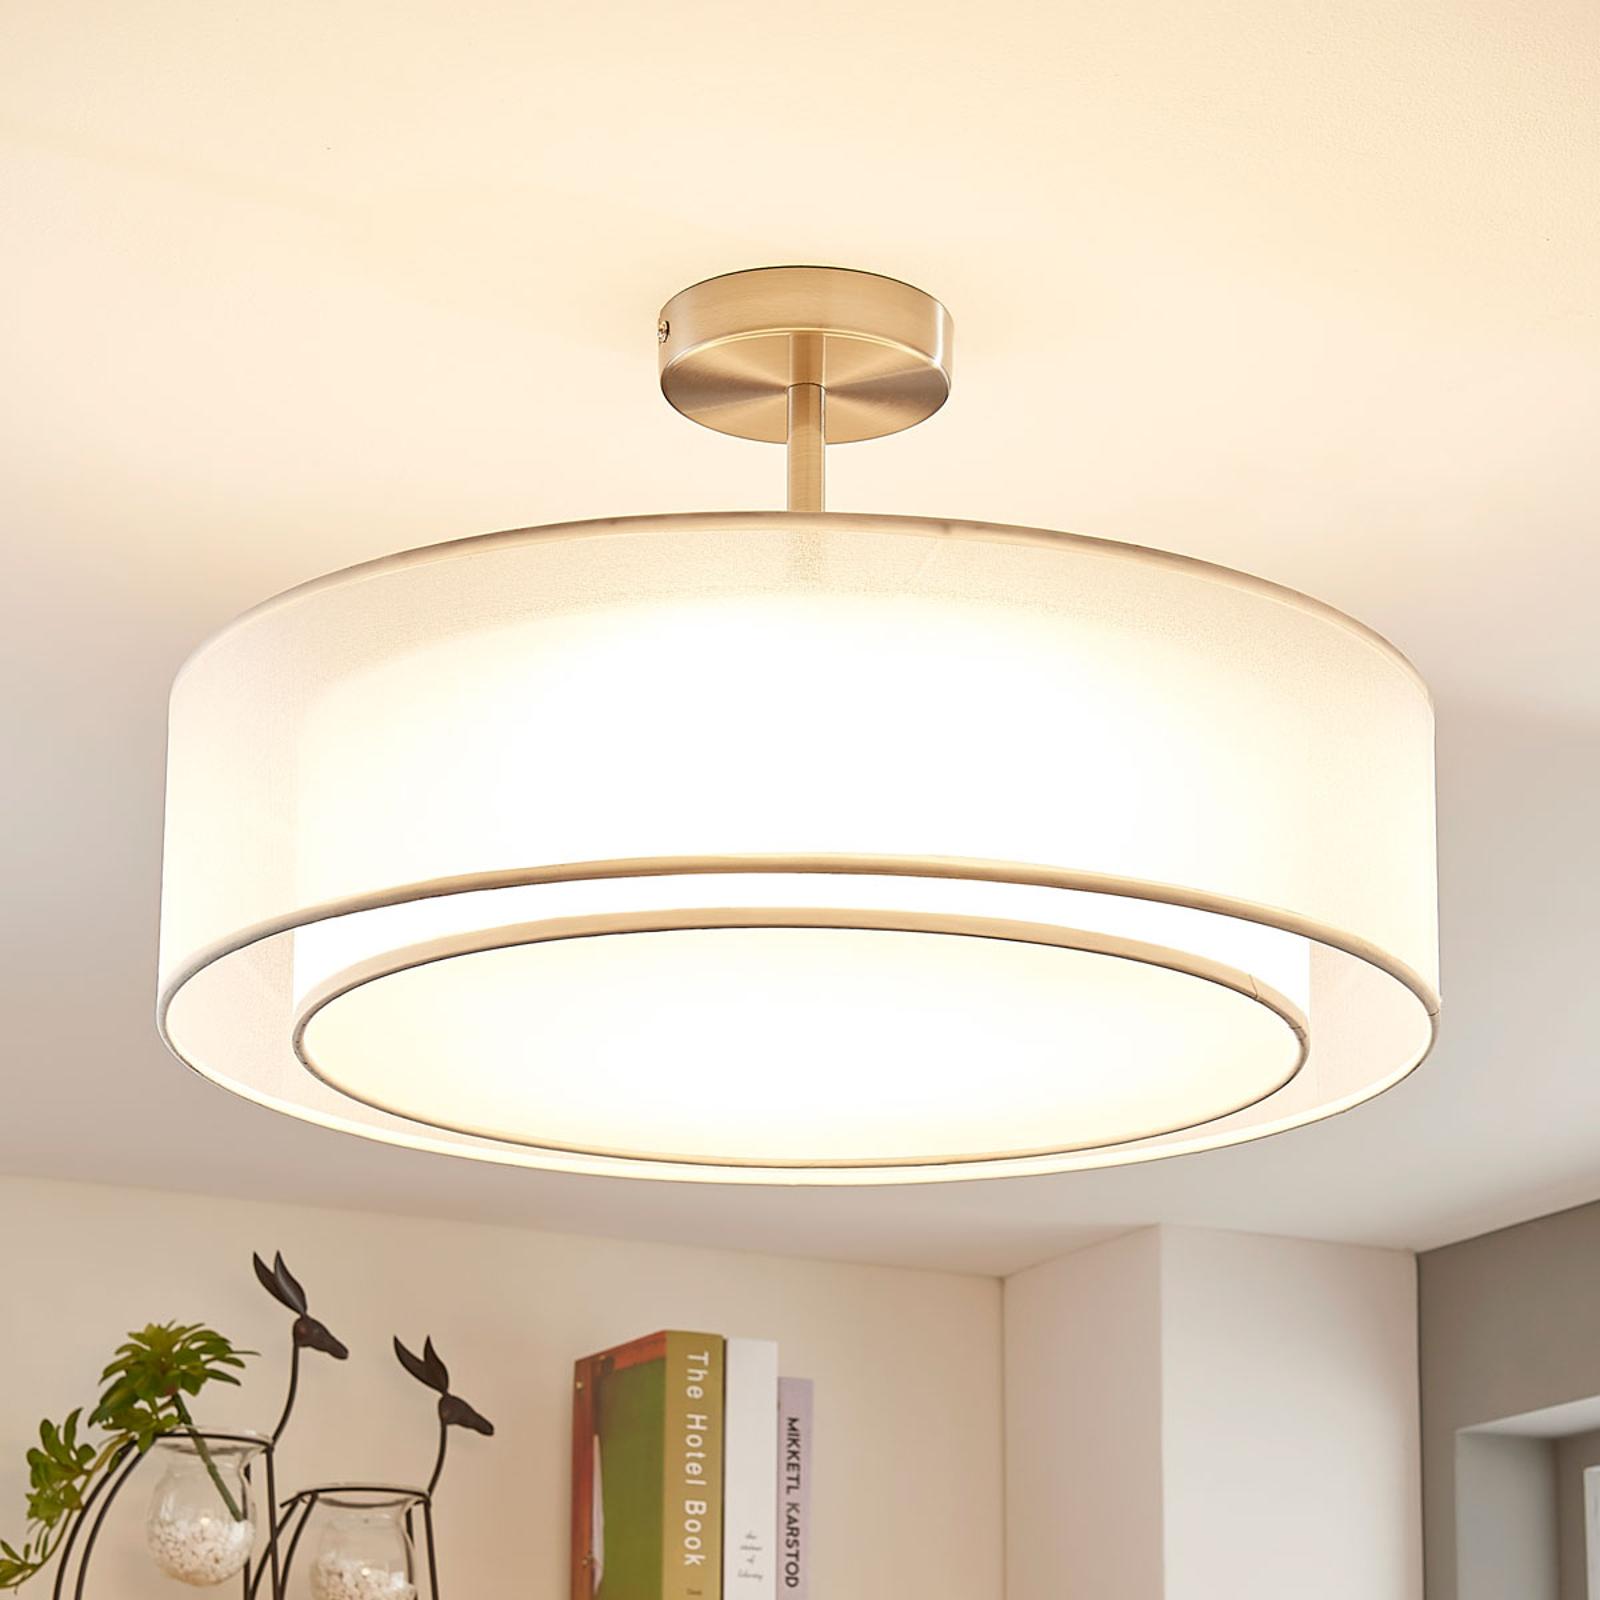 Pikka LED-loftlampe, 3 trin dæmpbar, hvid